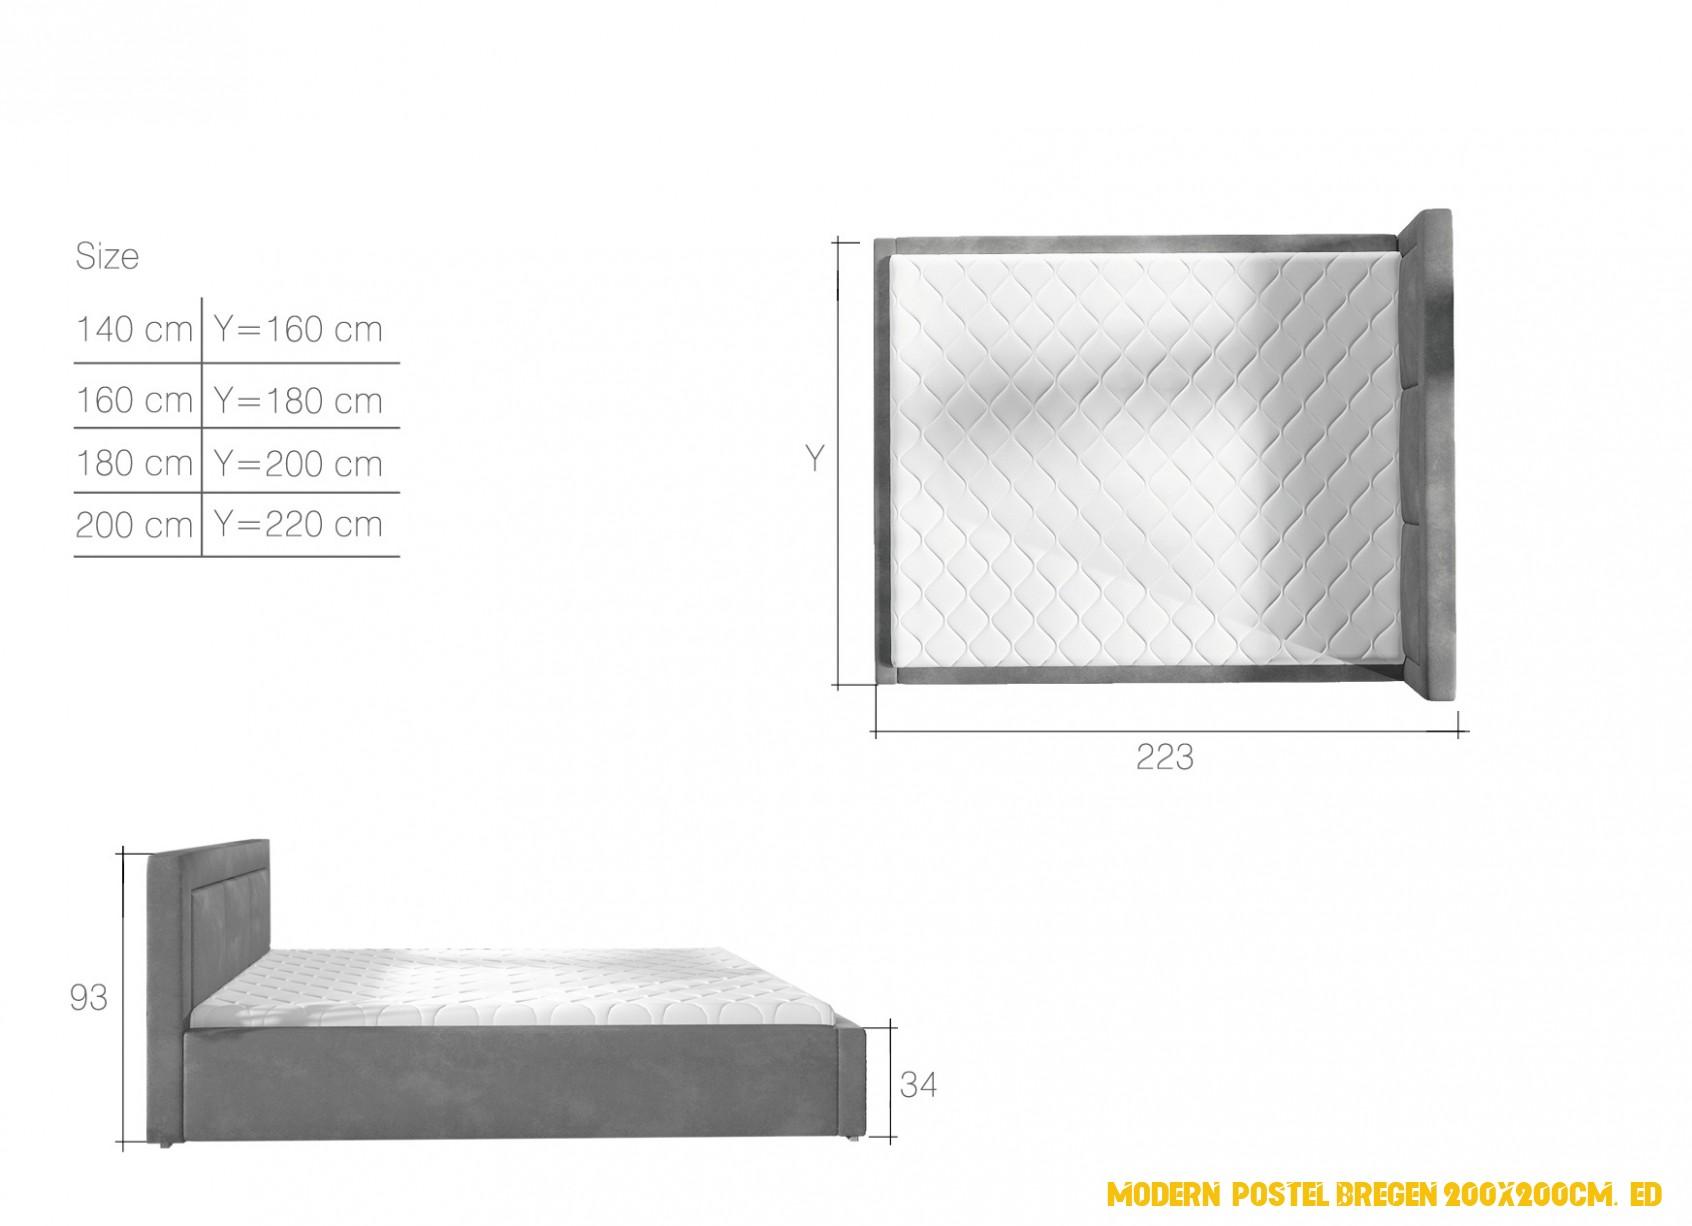 Moderní postel Bregen 4x4cm, bílá